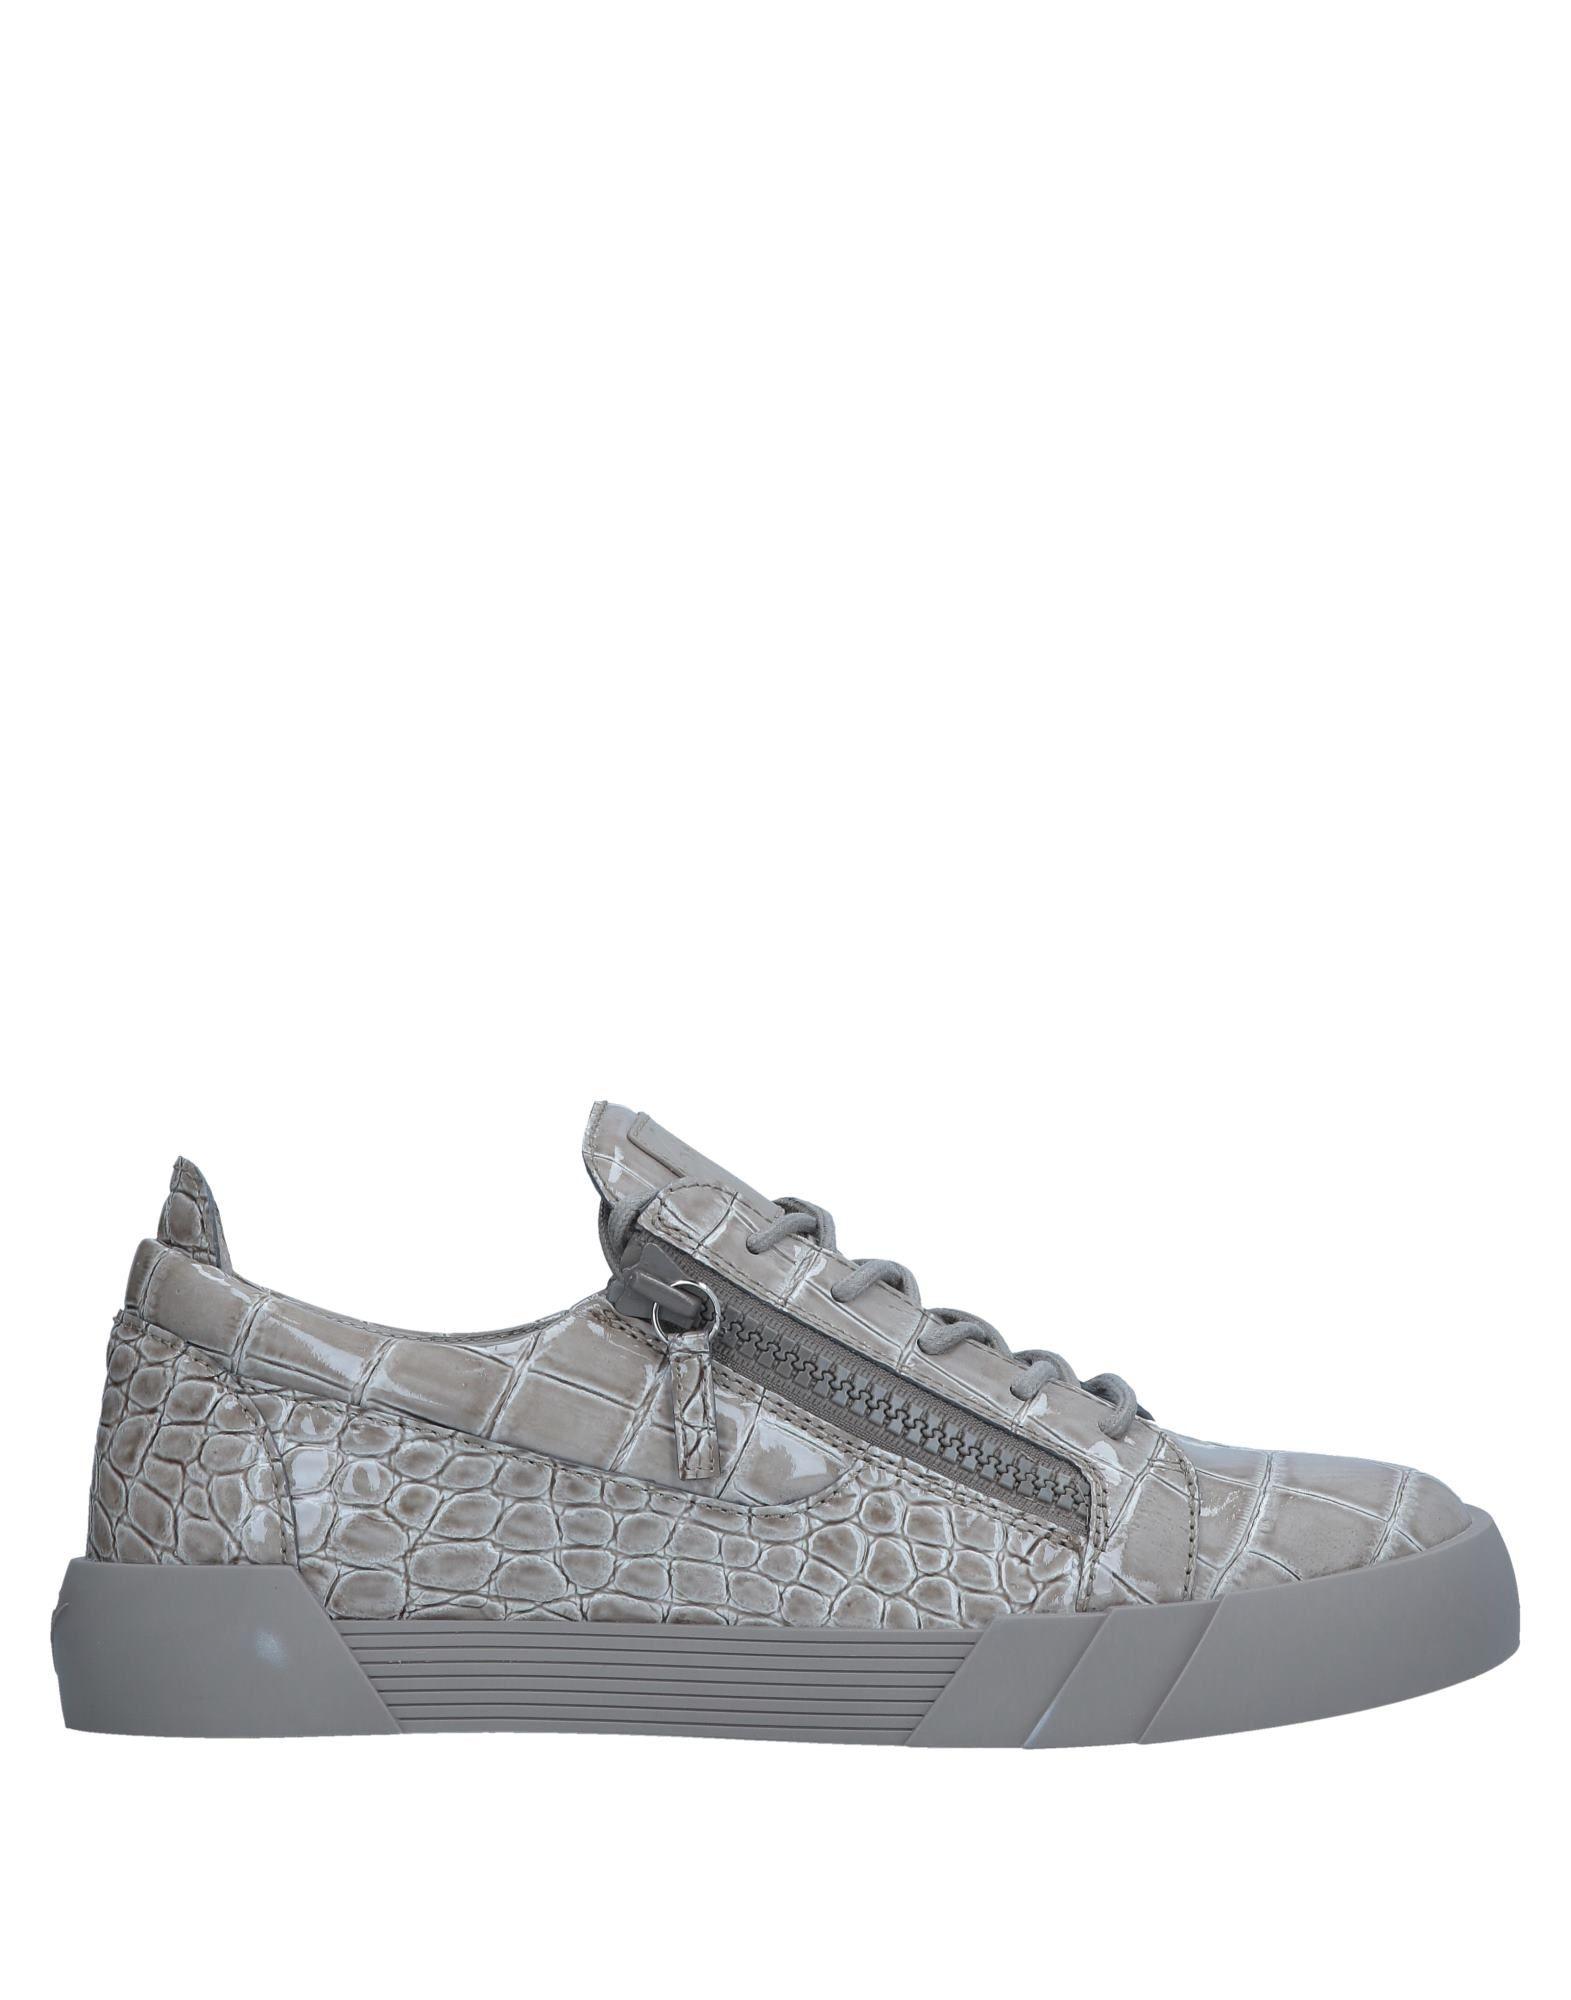 Giuseppe Zanotti Sneakers Herren  11544494EC Gute Qualität beliebte Schuhe